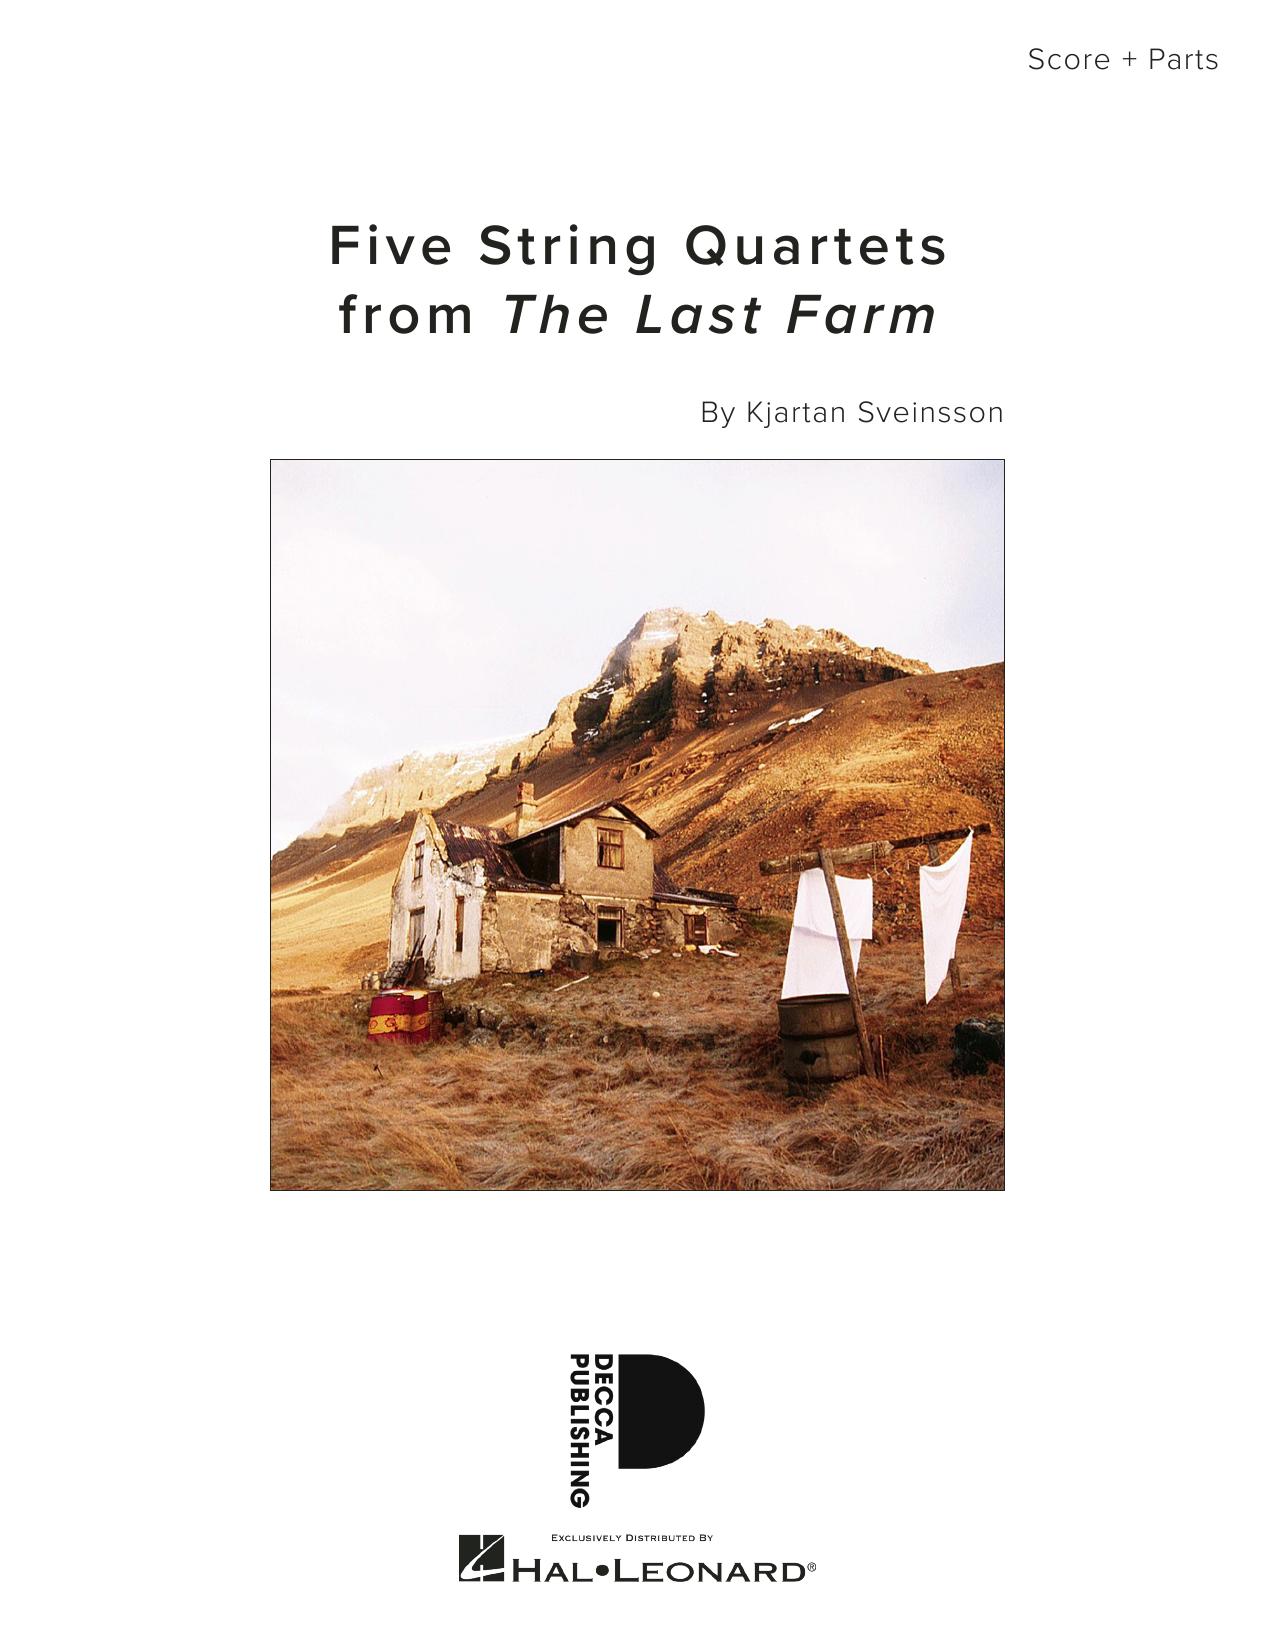 Five String Quartets from The Last Farm - Full Score Sheet Music